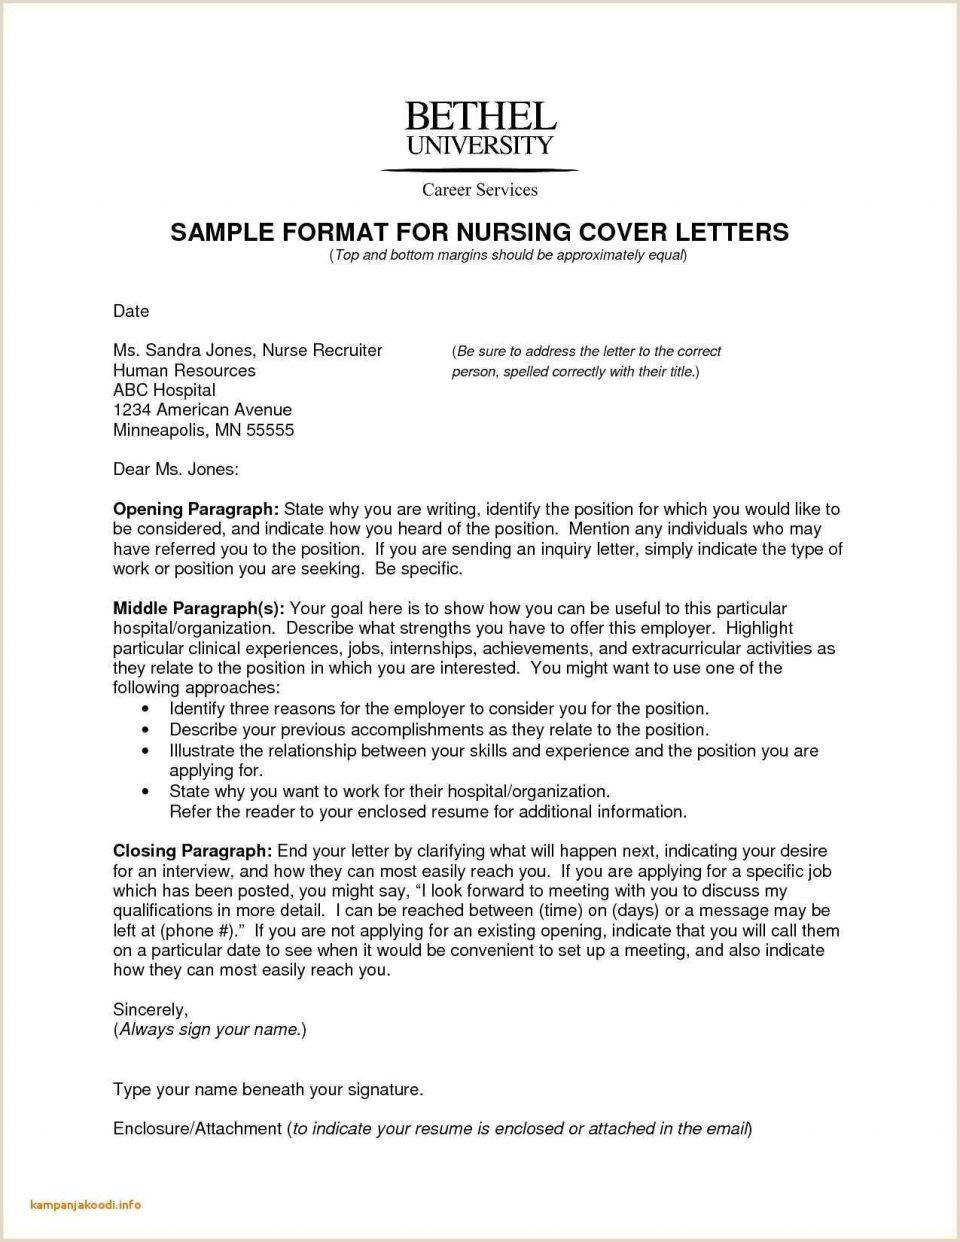 Professional Cv Template Word format Resumes for Nurses Resume Nursing Best Template Sample